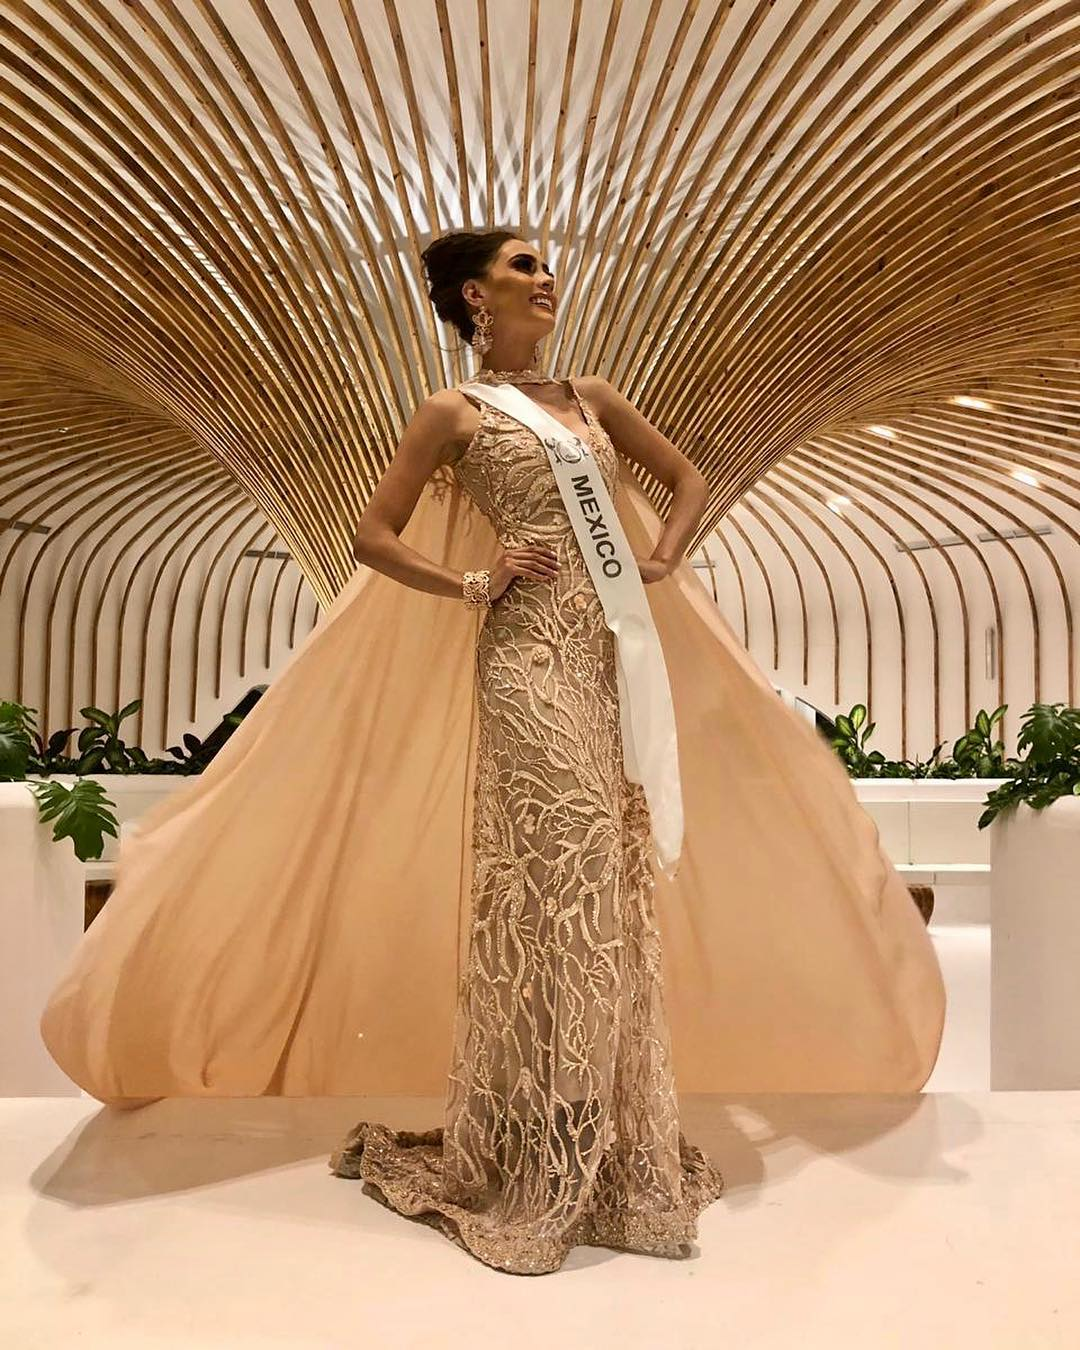 ivonne hernandez, semifinalista de top model of the world 2018. - Página 4 Ge5lub10